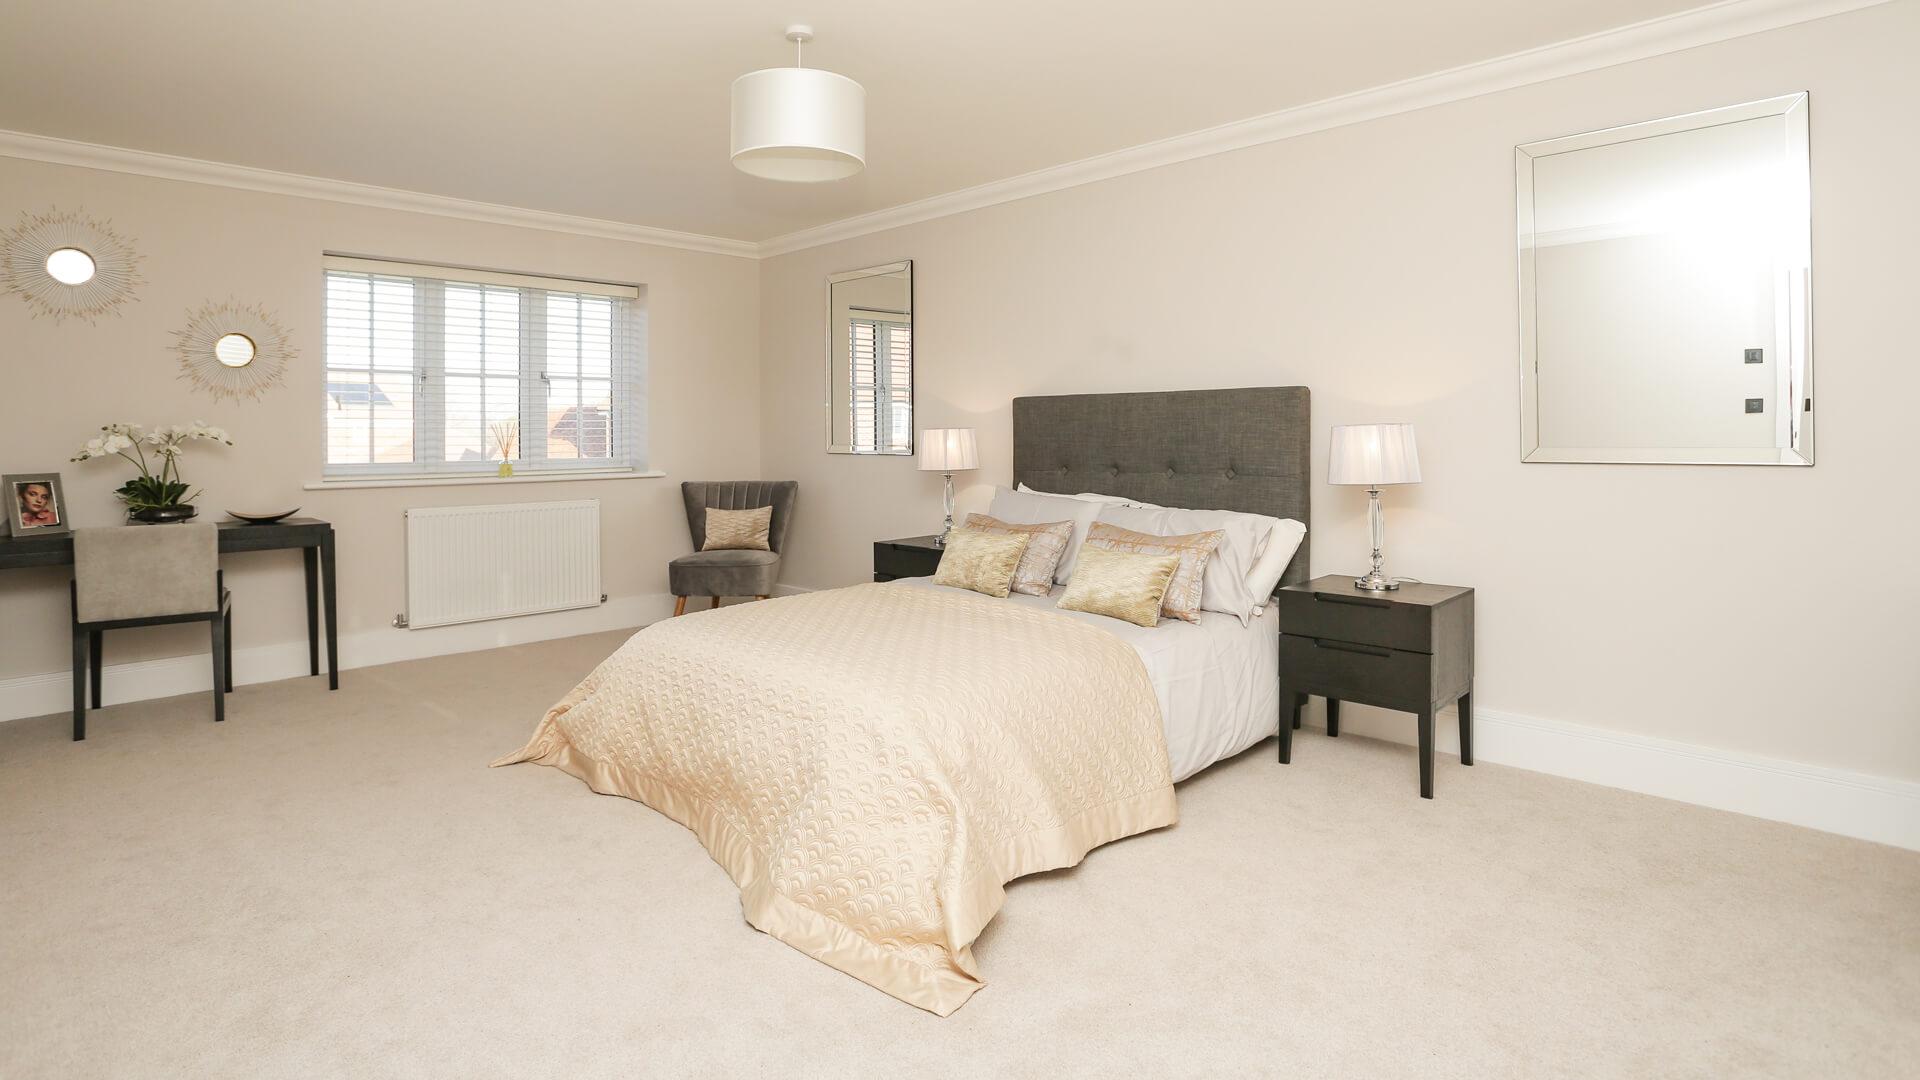 Bedroom 2 at Weavers park Plot 11.